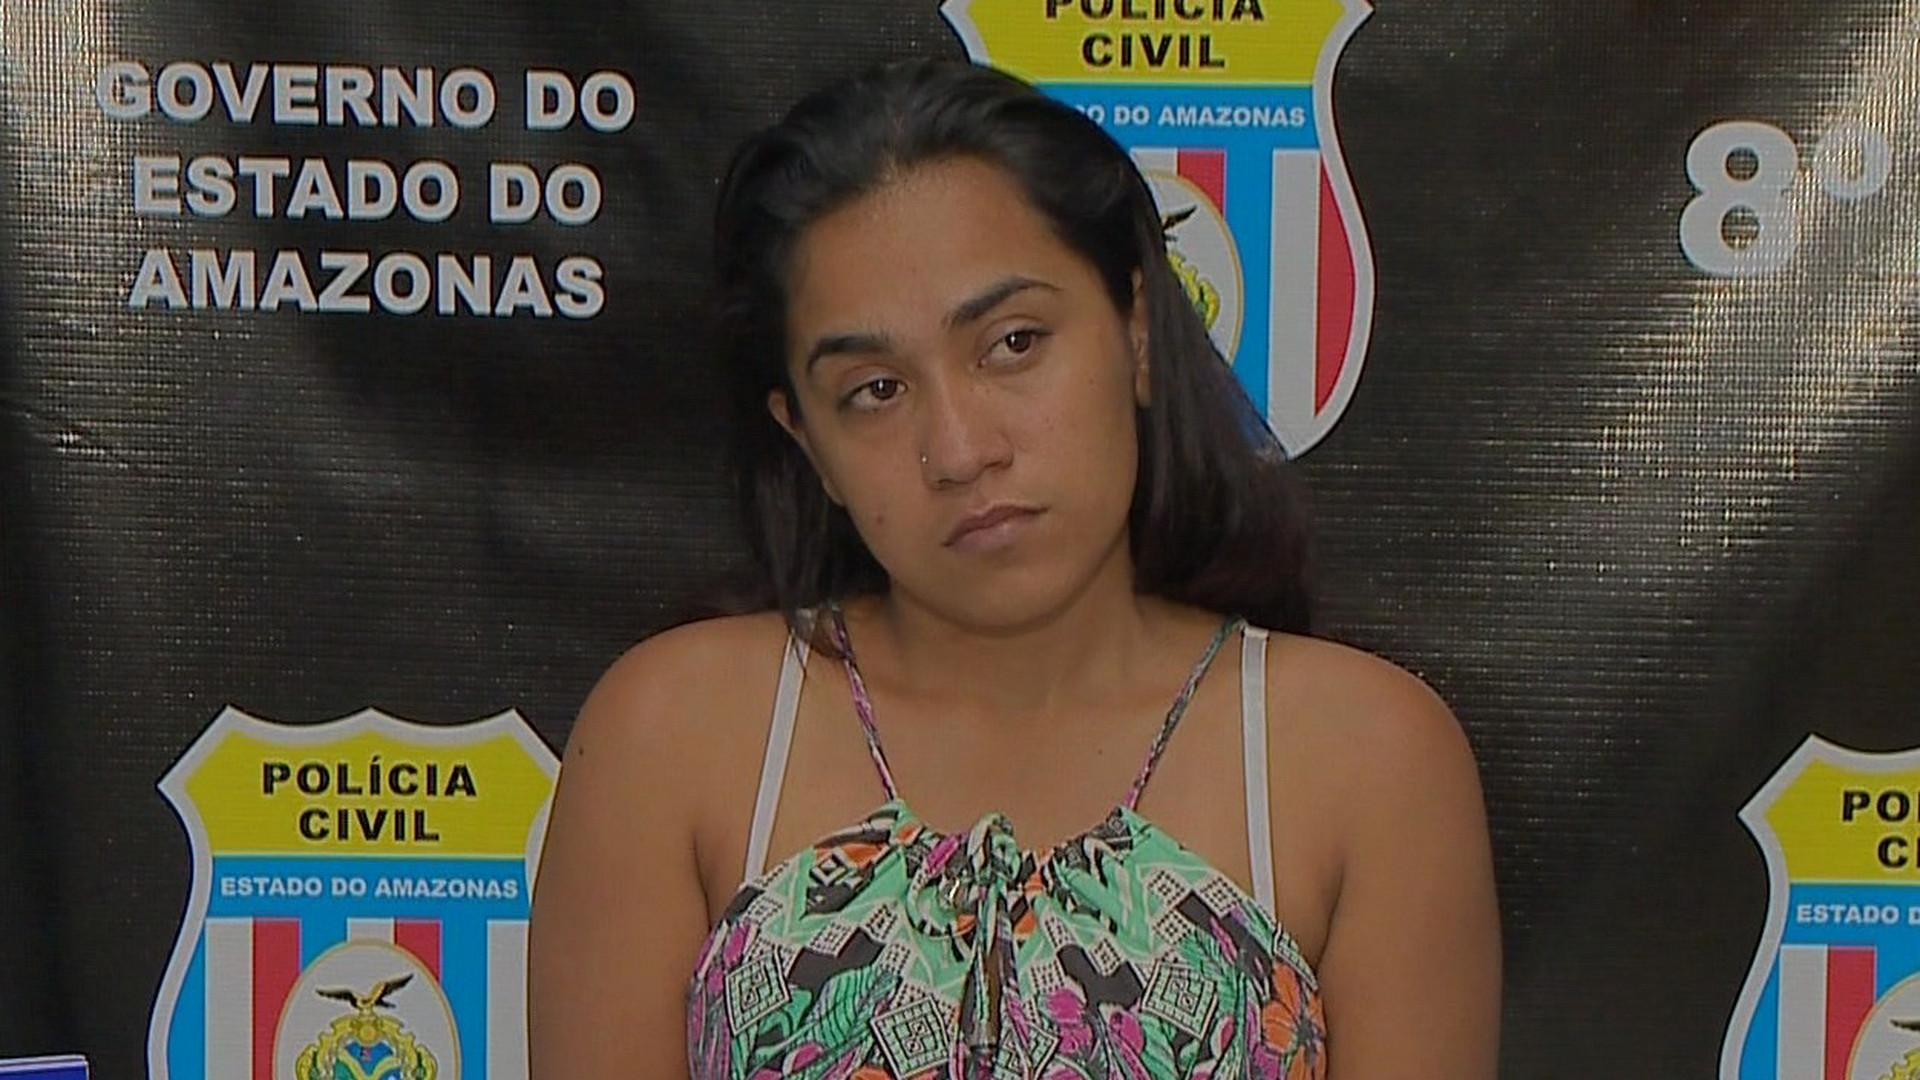 FLAGRANTE: APÓS DENÚNCIAS MULHER É PRESA POR TRÁFICO - Alô Amazonas - 18/08/17 - Manhã no Ar 18/08/2017